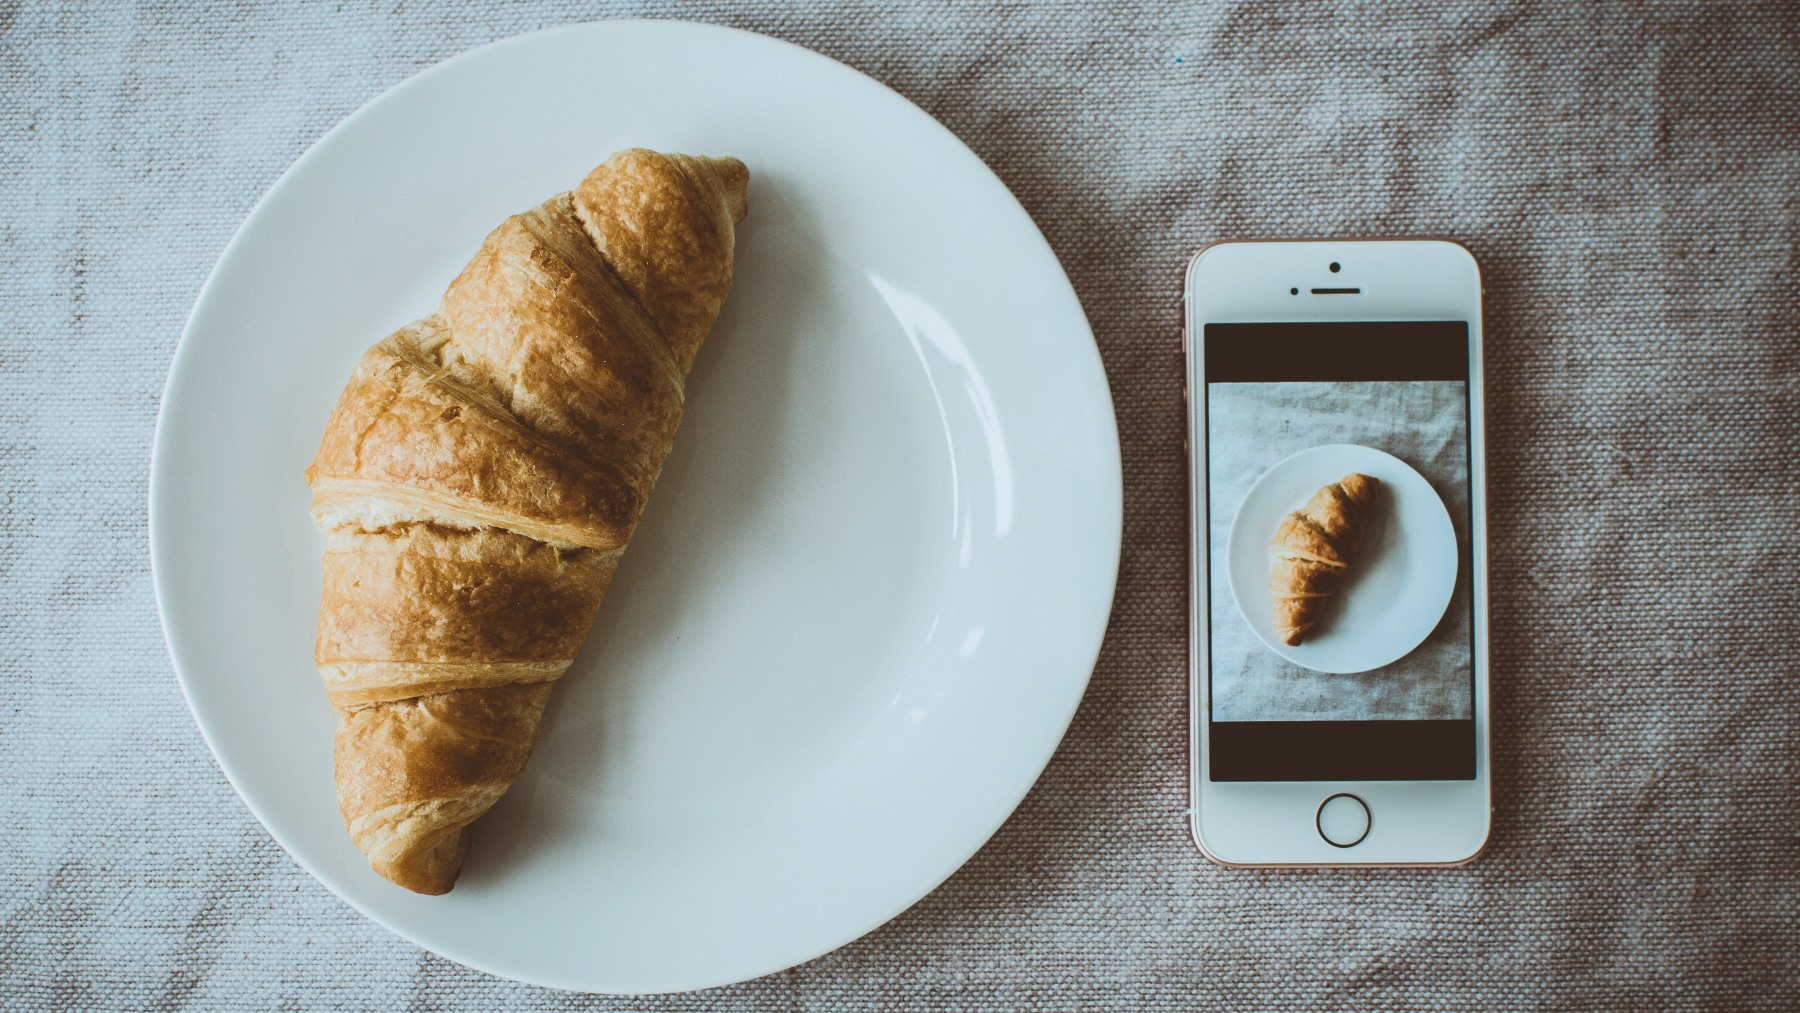 El sorprendente origen del croissant